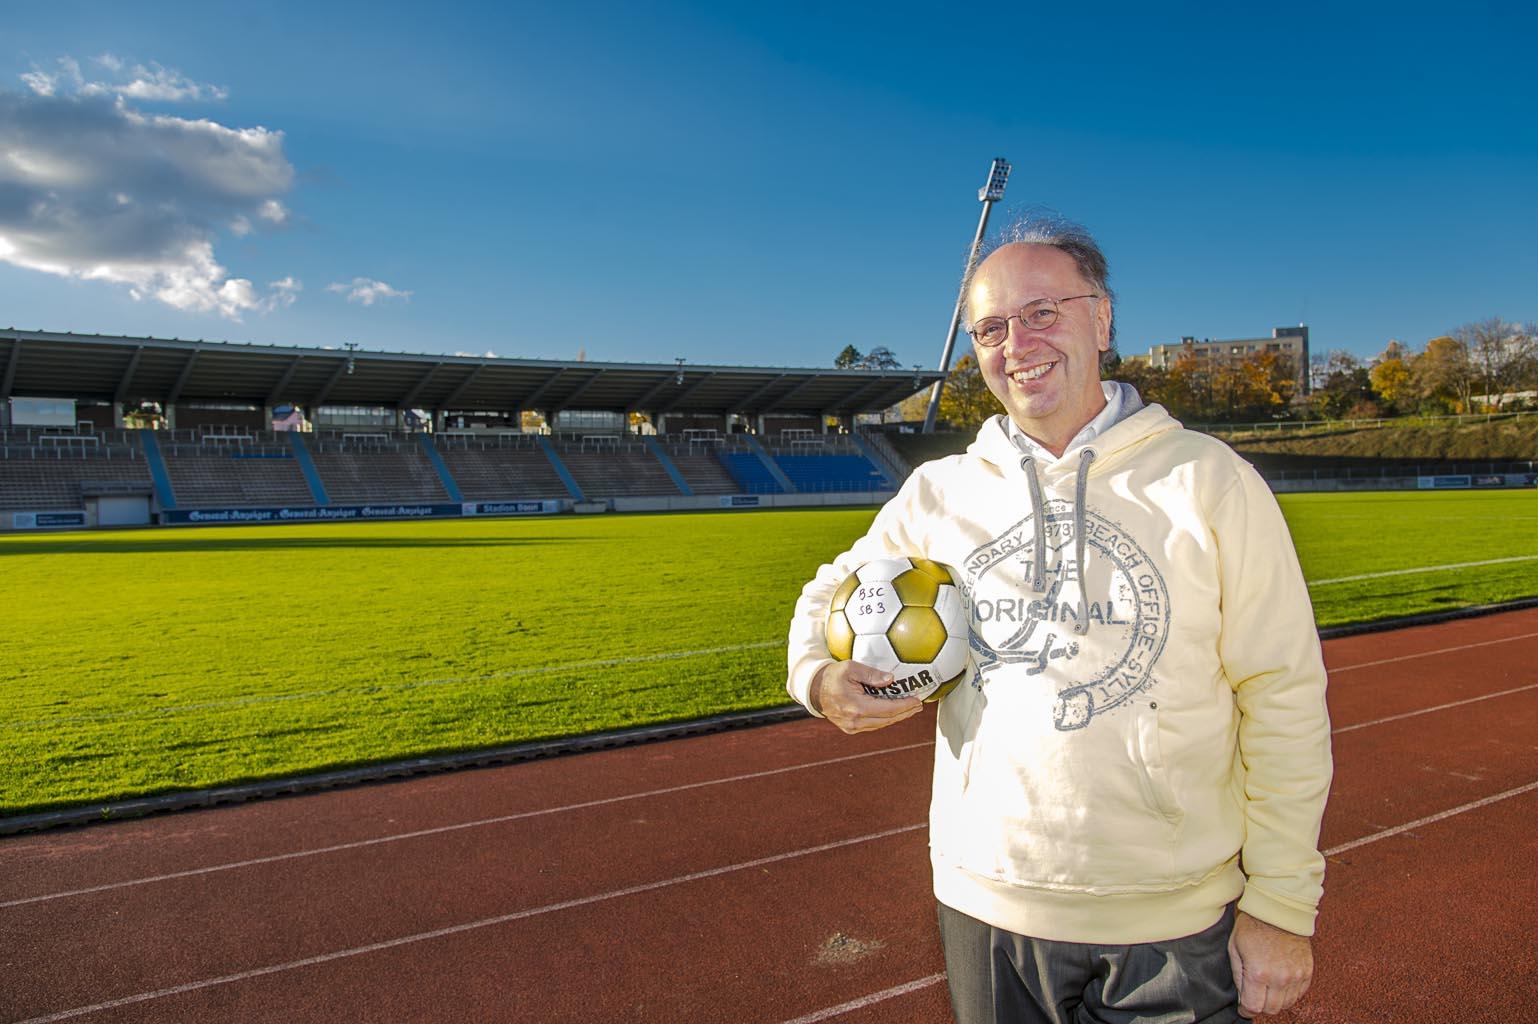 Rolf Sport Fußball Stadion Sportpark Bonn